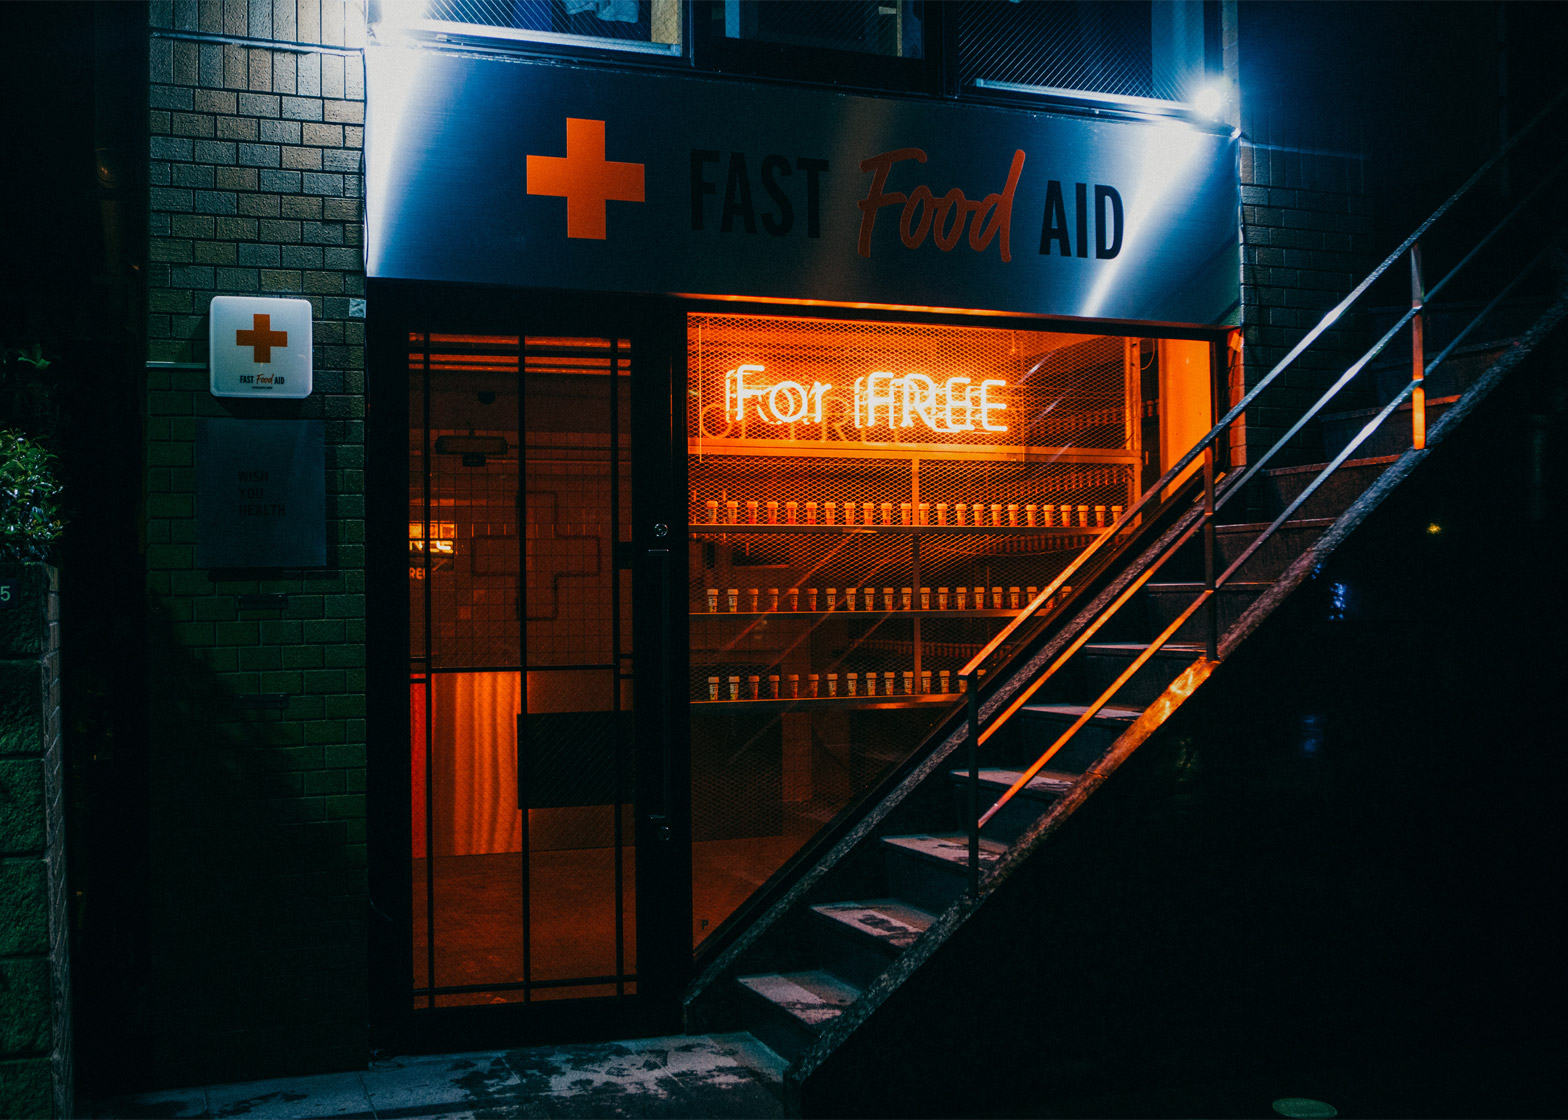 fast food aid harajuku shop